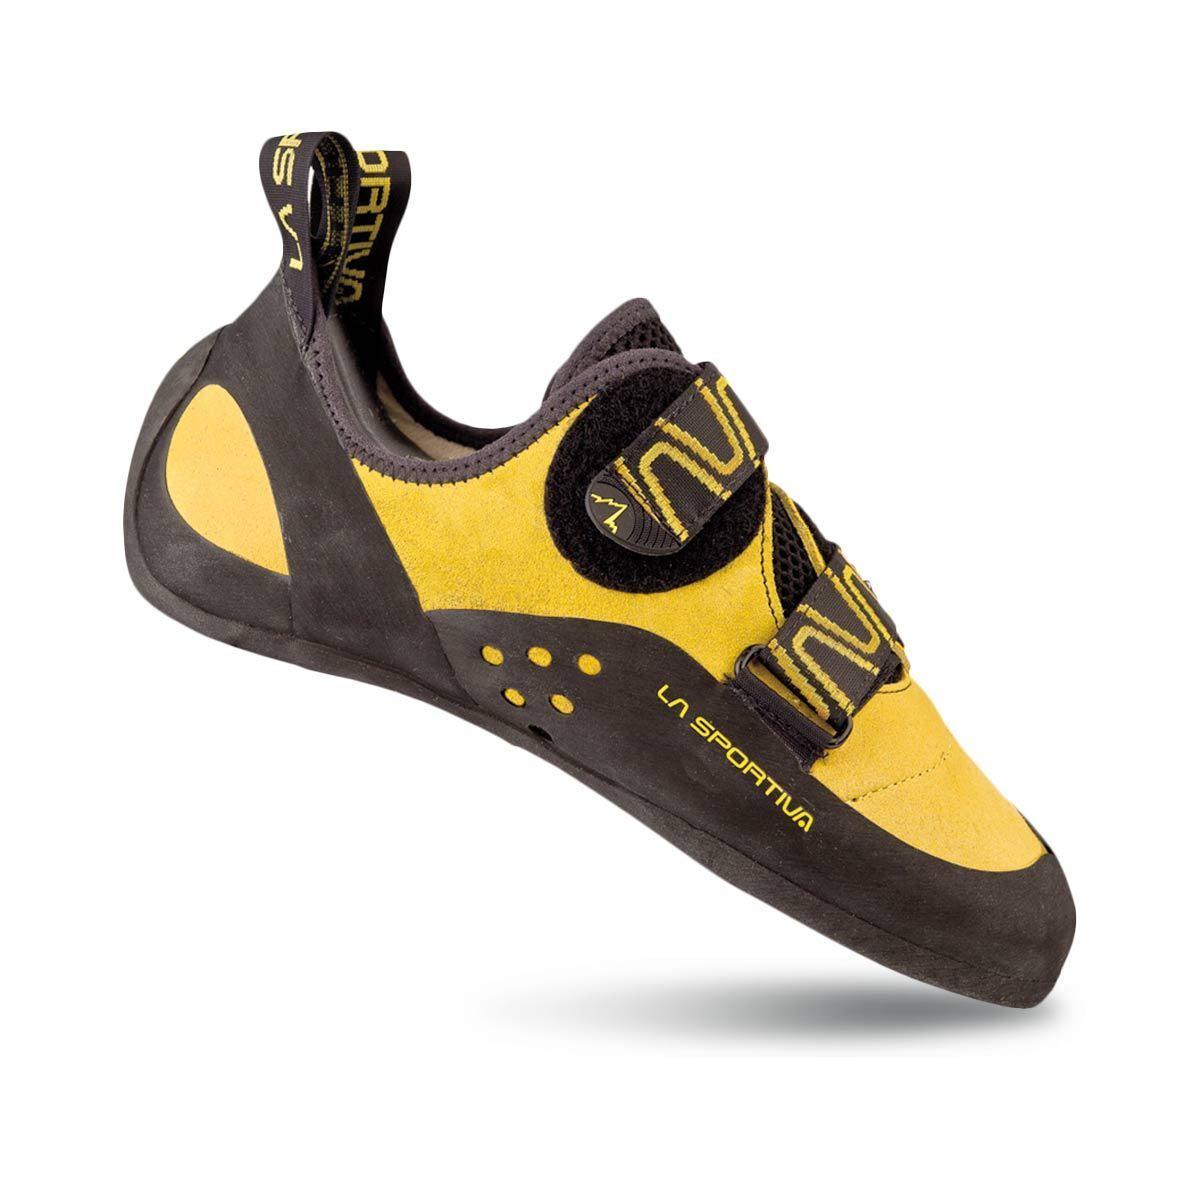 La Sportiva Katana Climbing shoes - Various sizes - Yellow - RRP